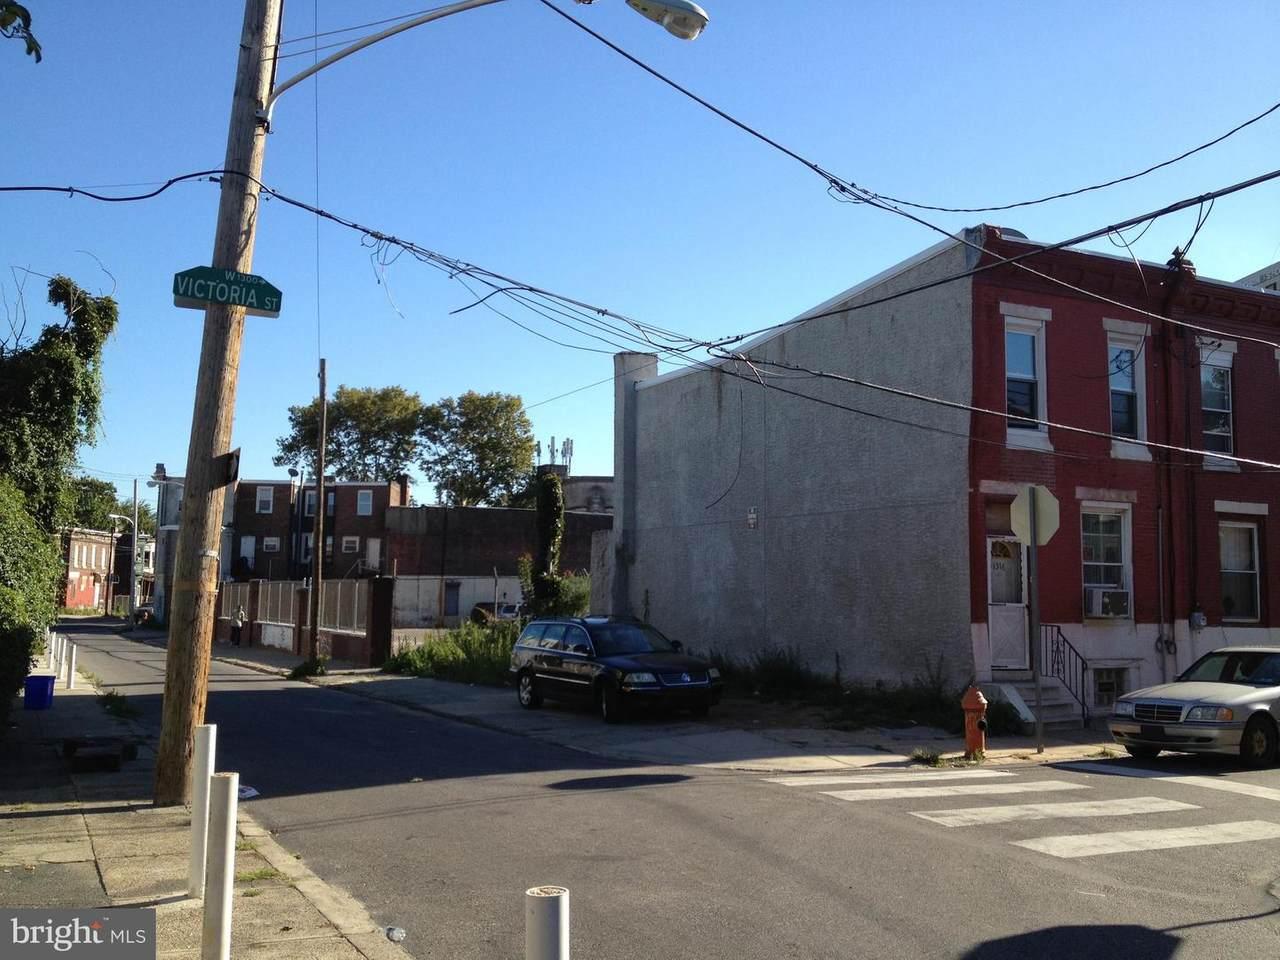 1314 Victoria Street - Photo 1